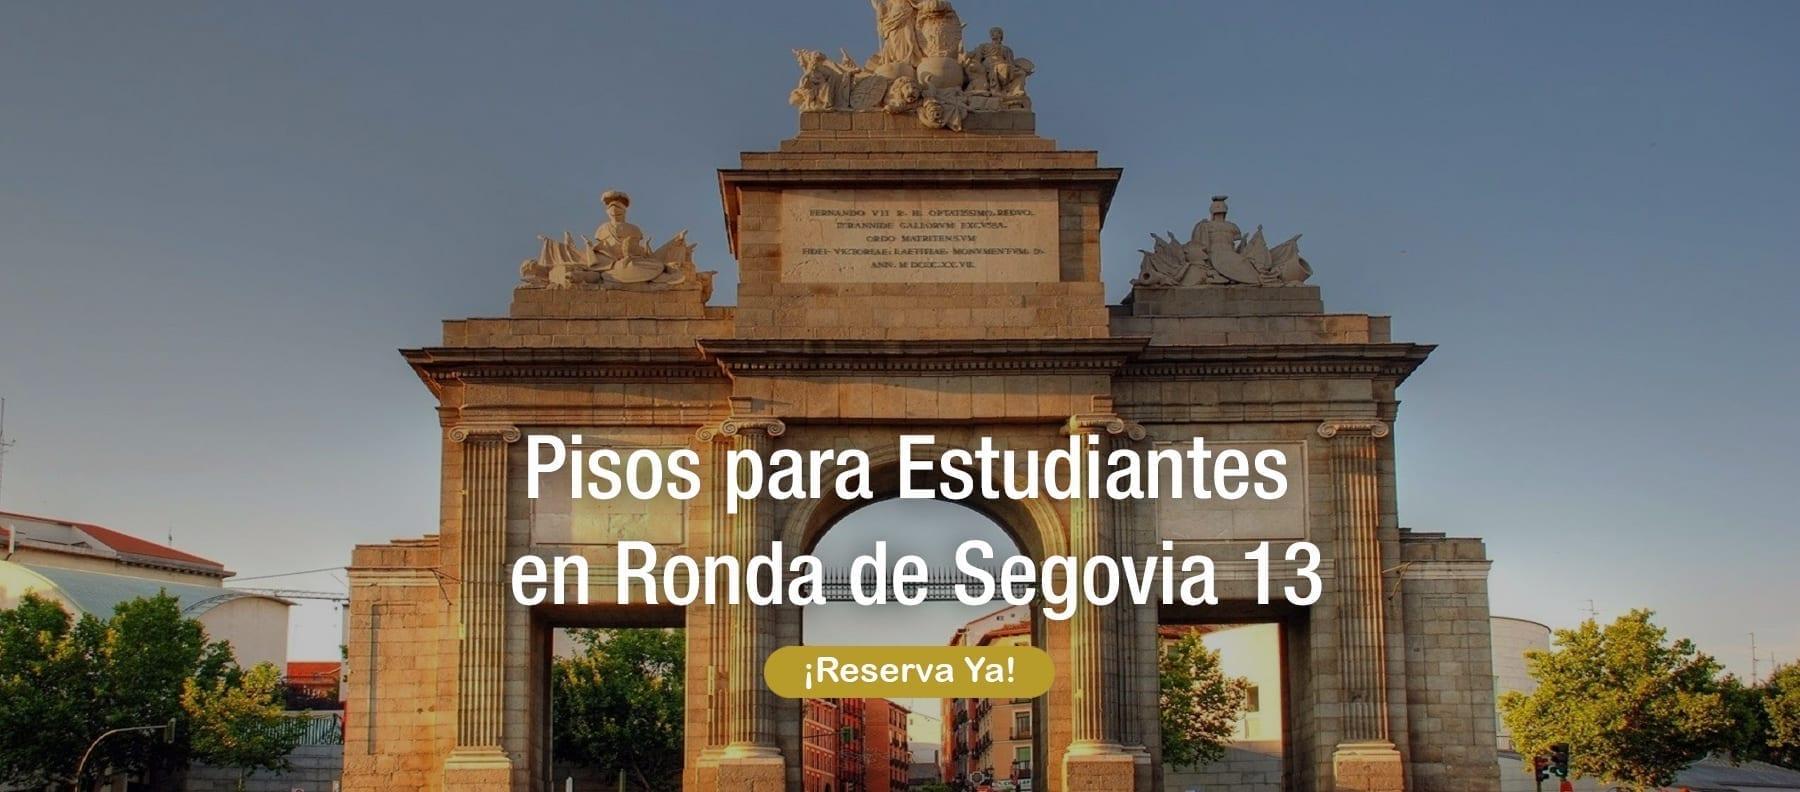 Pisos para estudiantes ronda segovia 13 Madrid